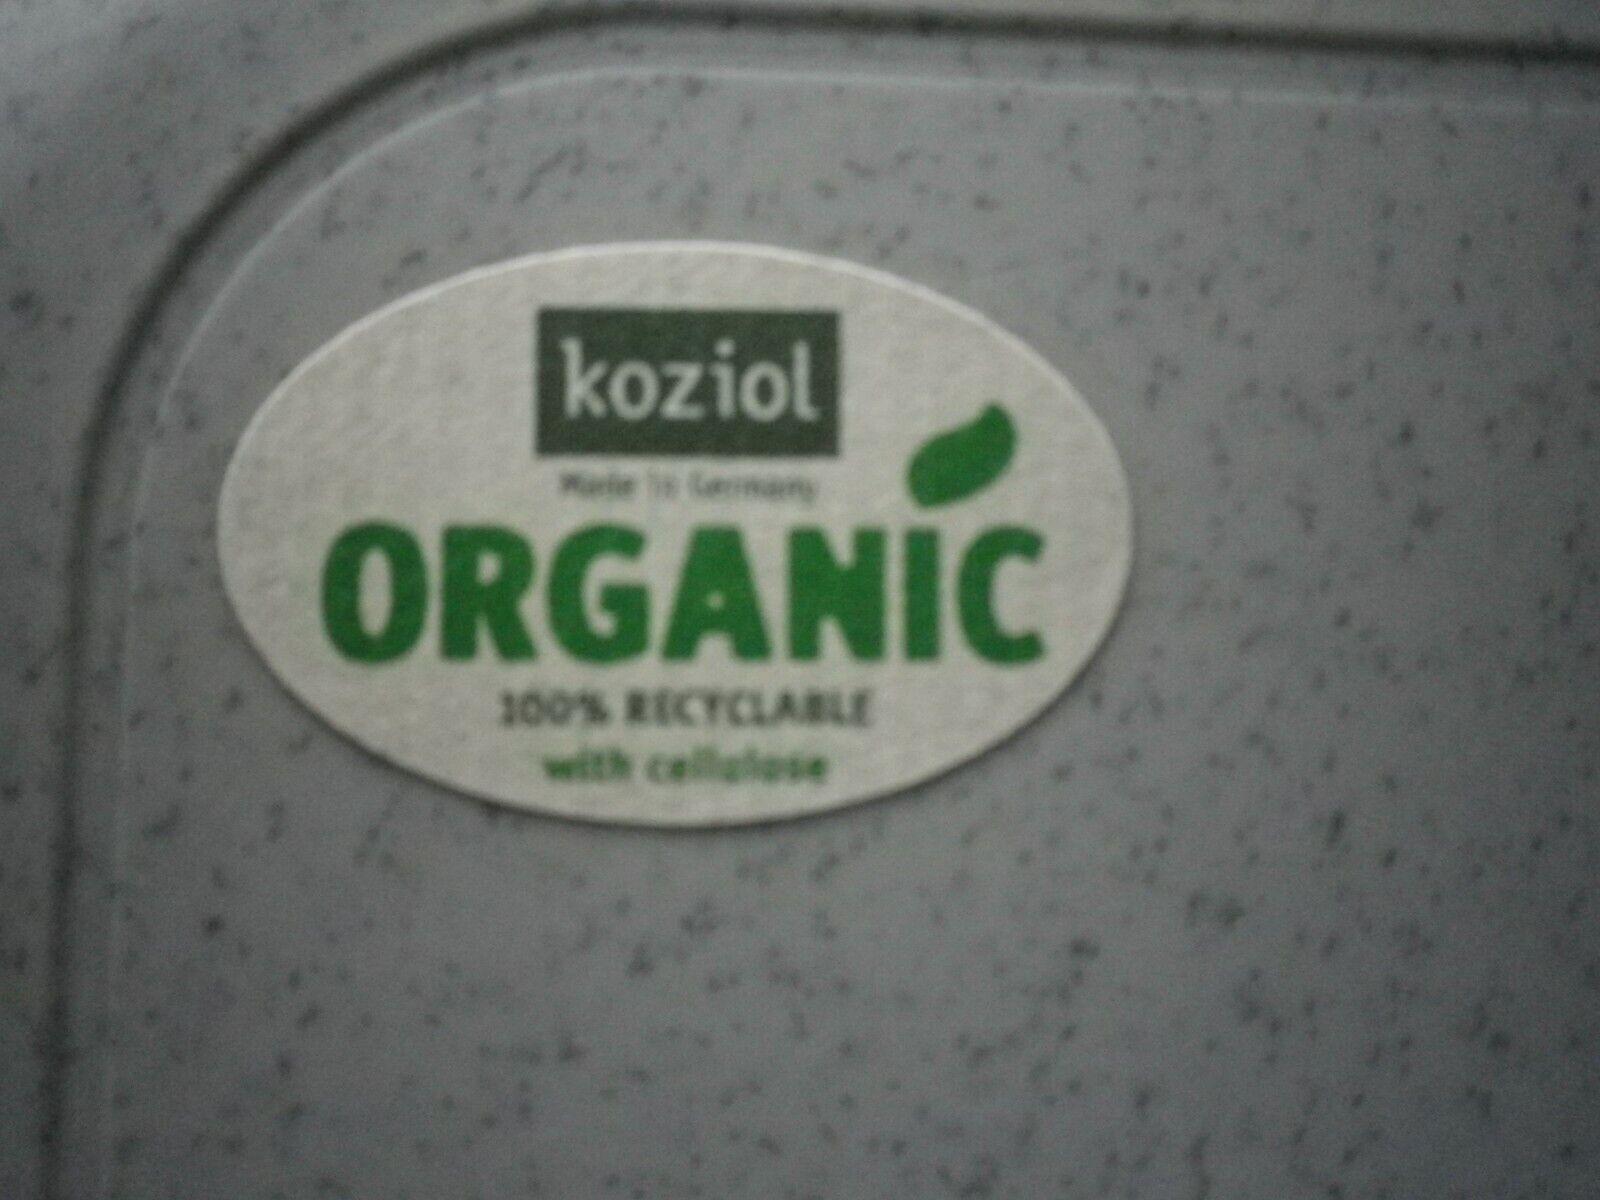 Koziol Lunchbox PASCAL S organic Brot Dose Büchse Schule Rügenwalder Iss mir Wur